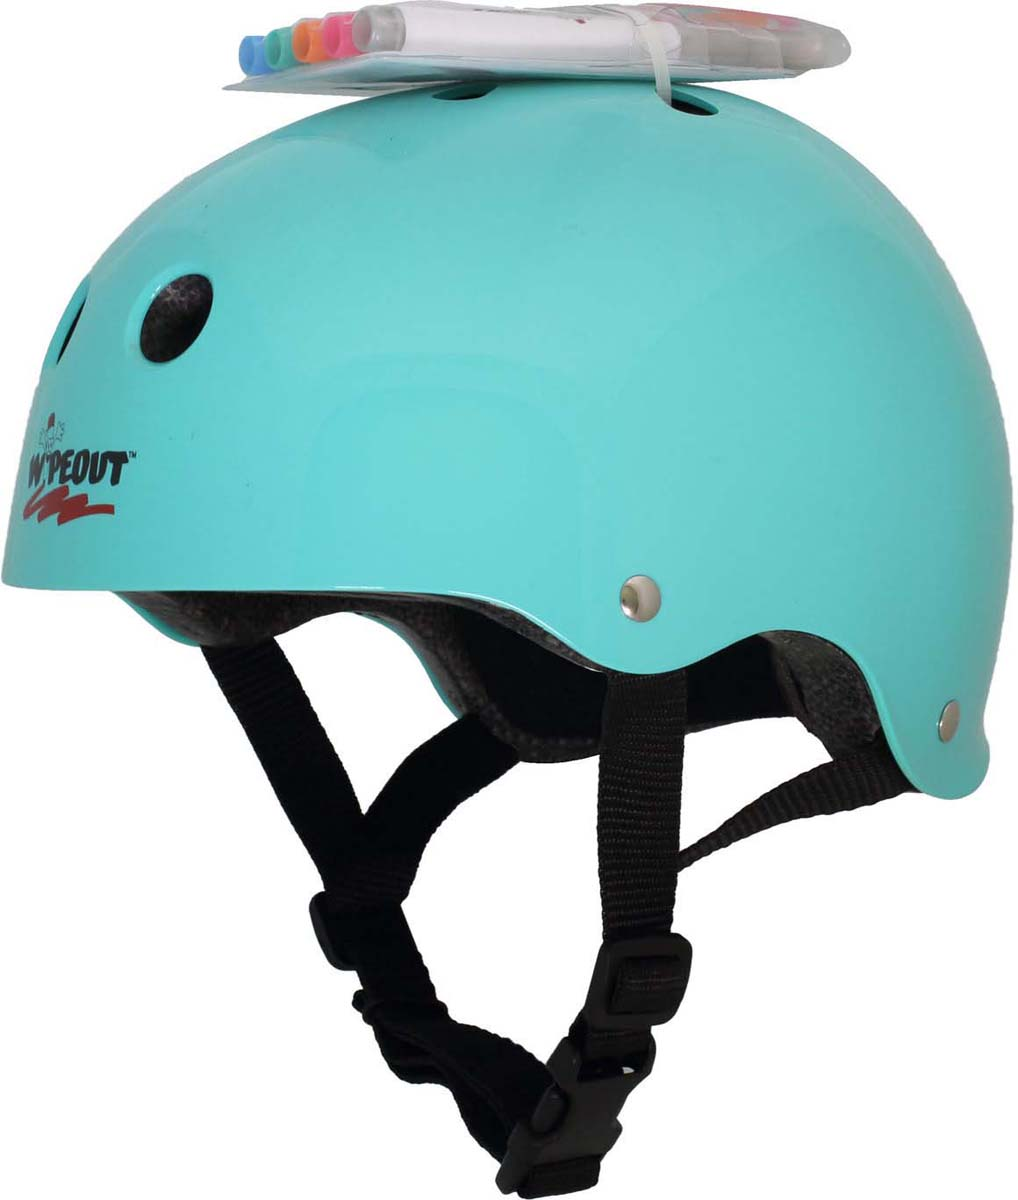 Шлем Wipeout, с фломастерами, цвет: бирюзовый. Размер M (5+)